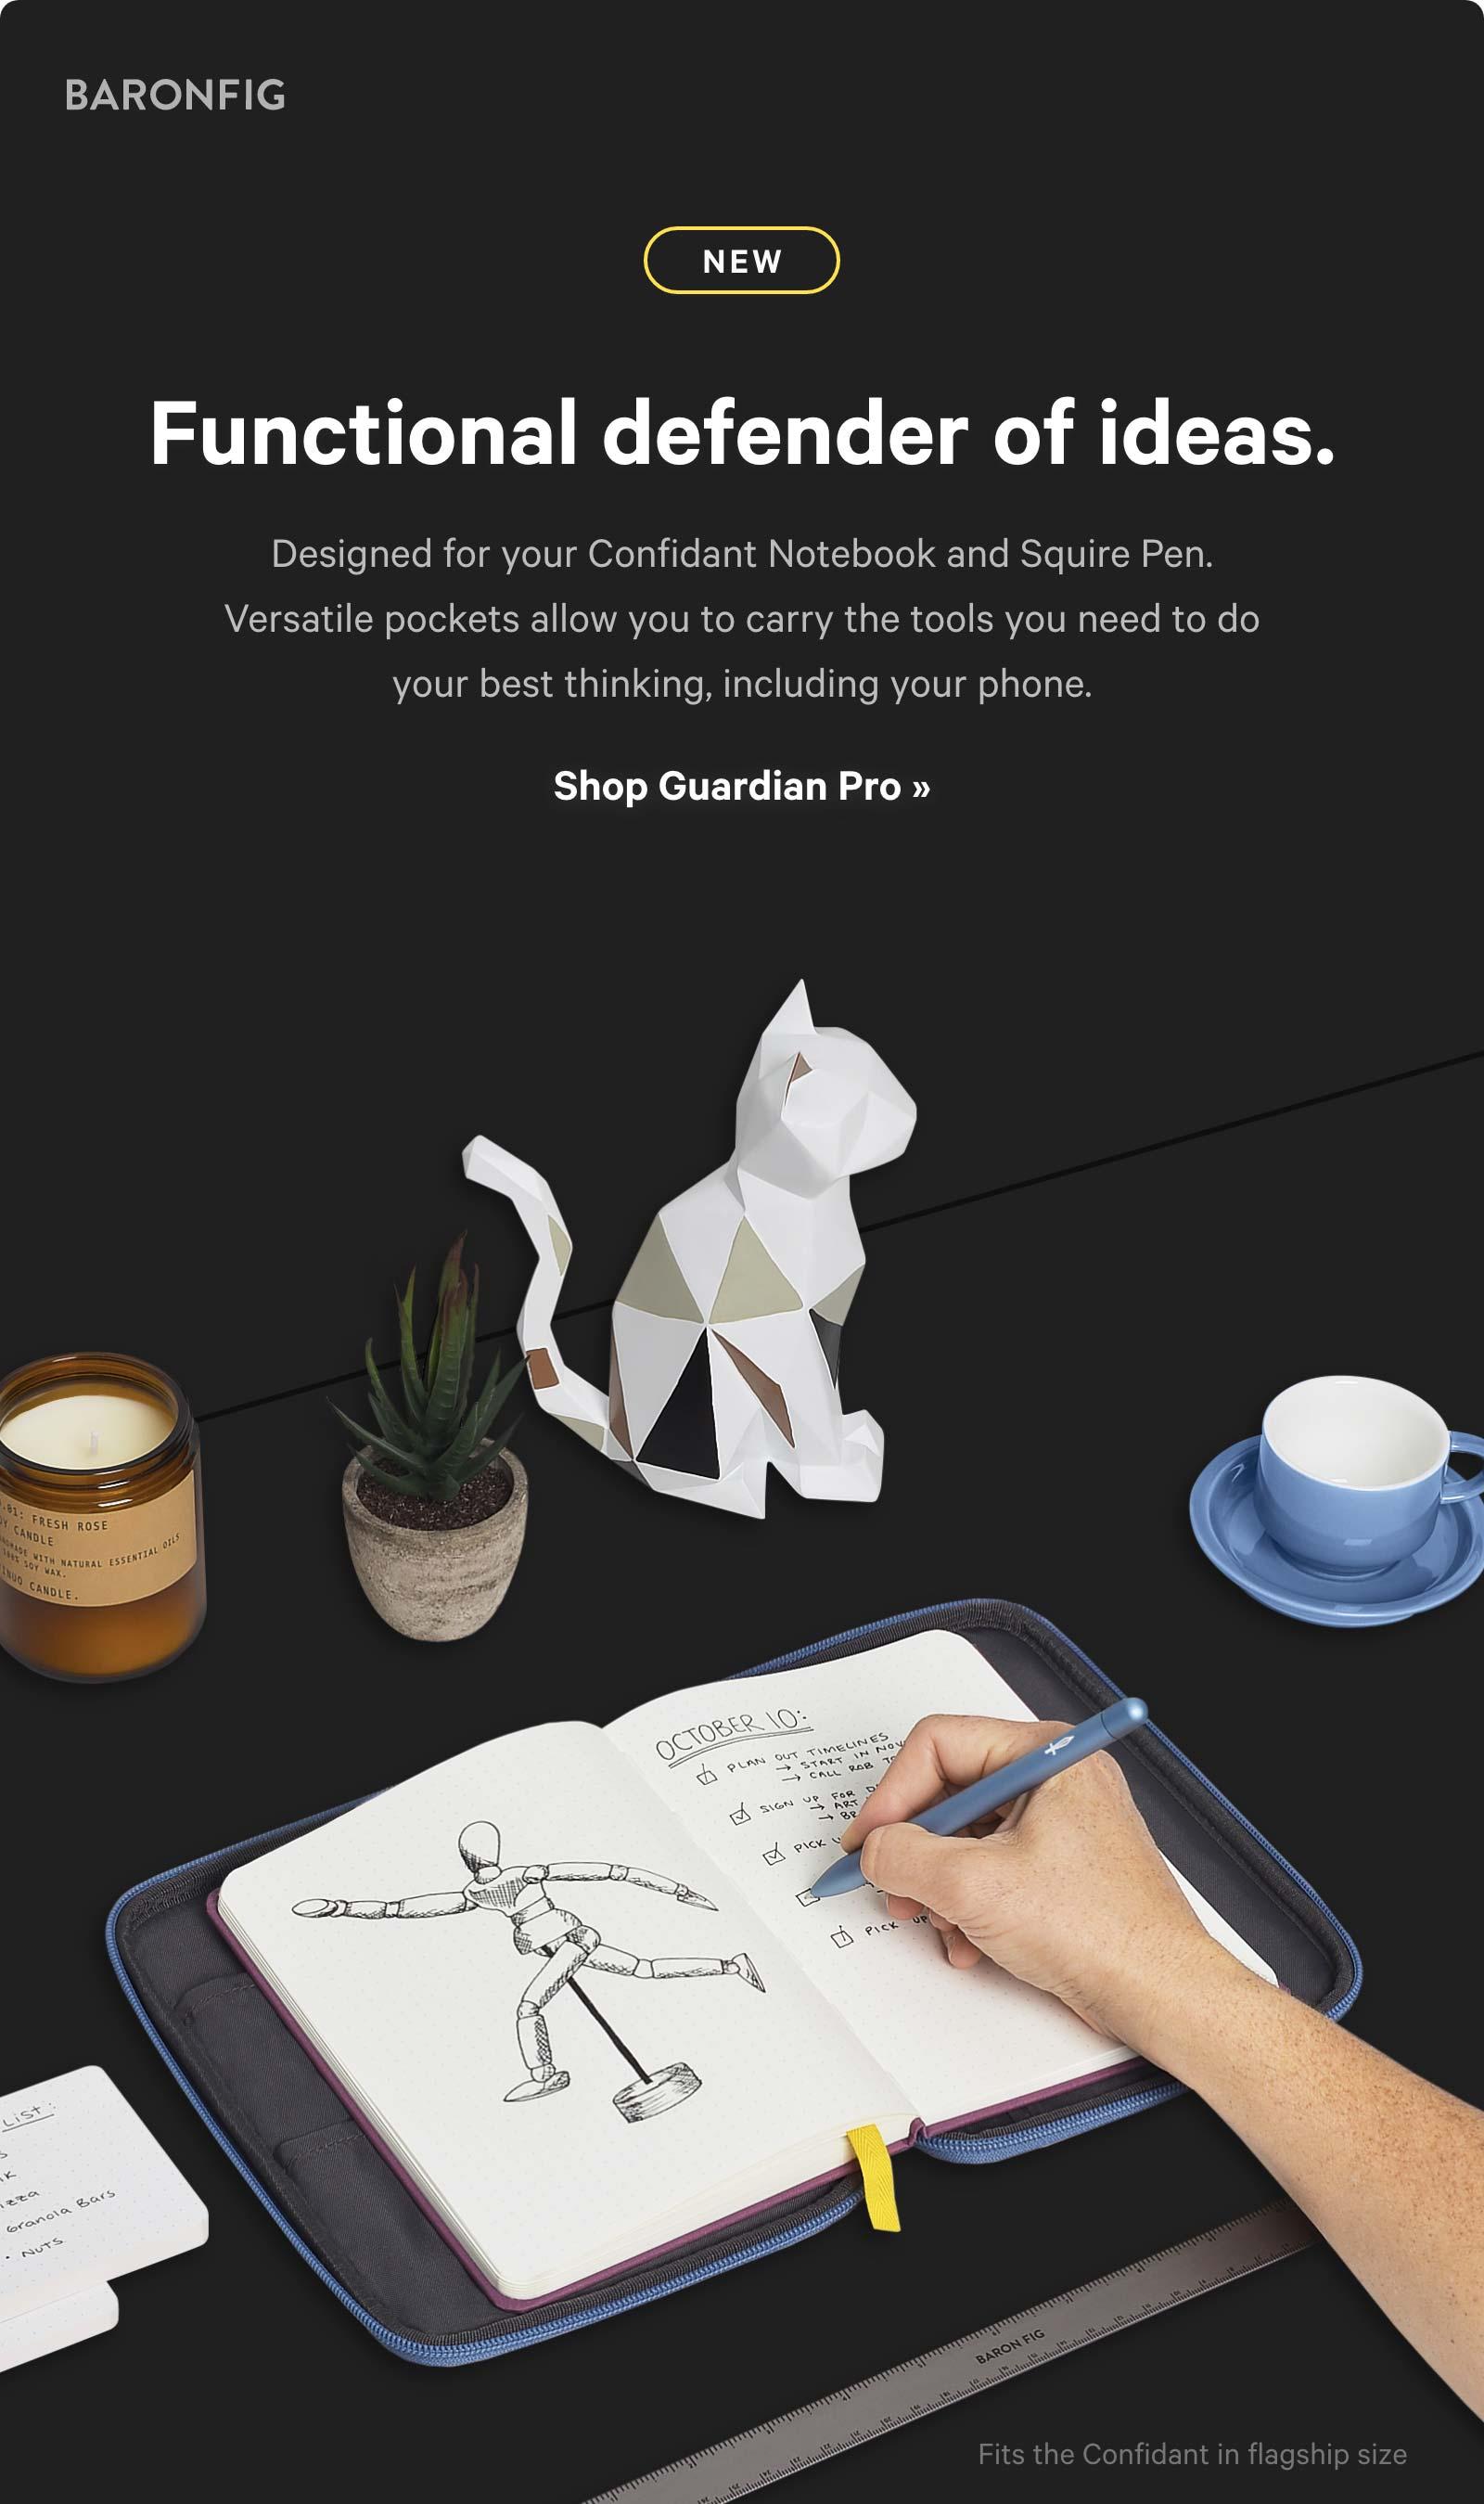 Functional defender of ideas. Shop Guardian Pro ?